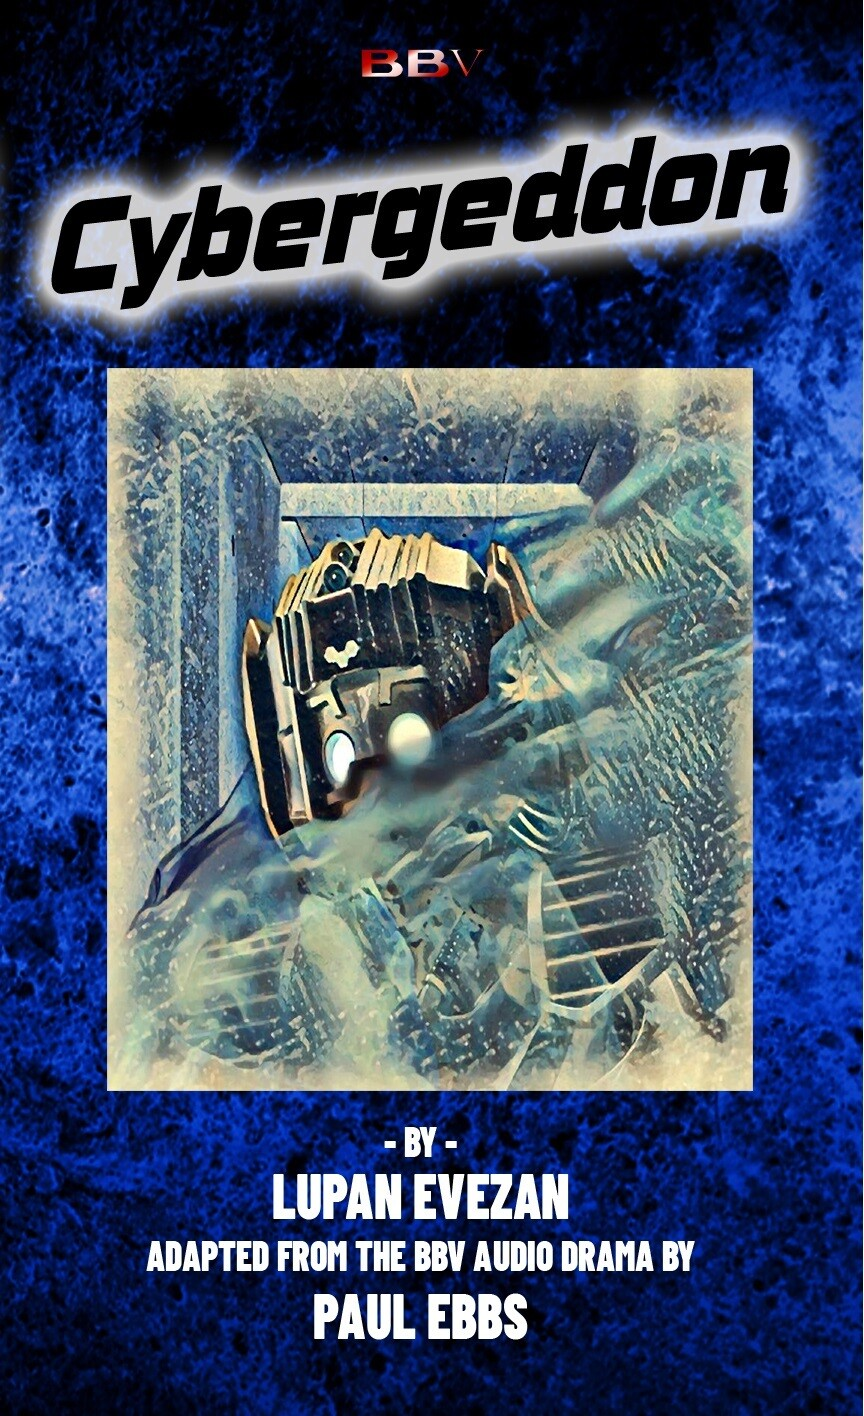 Cybergeddon Novelisation (A5 SIZE BOOK)